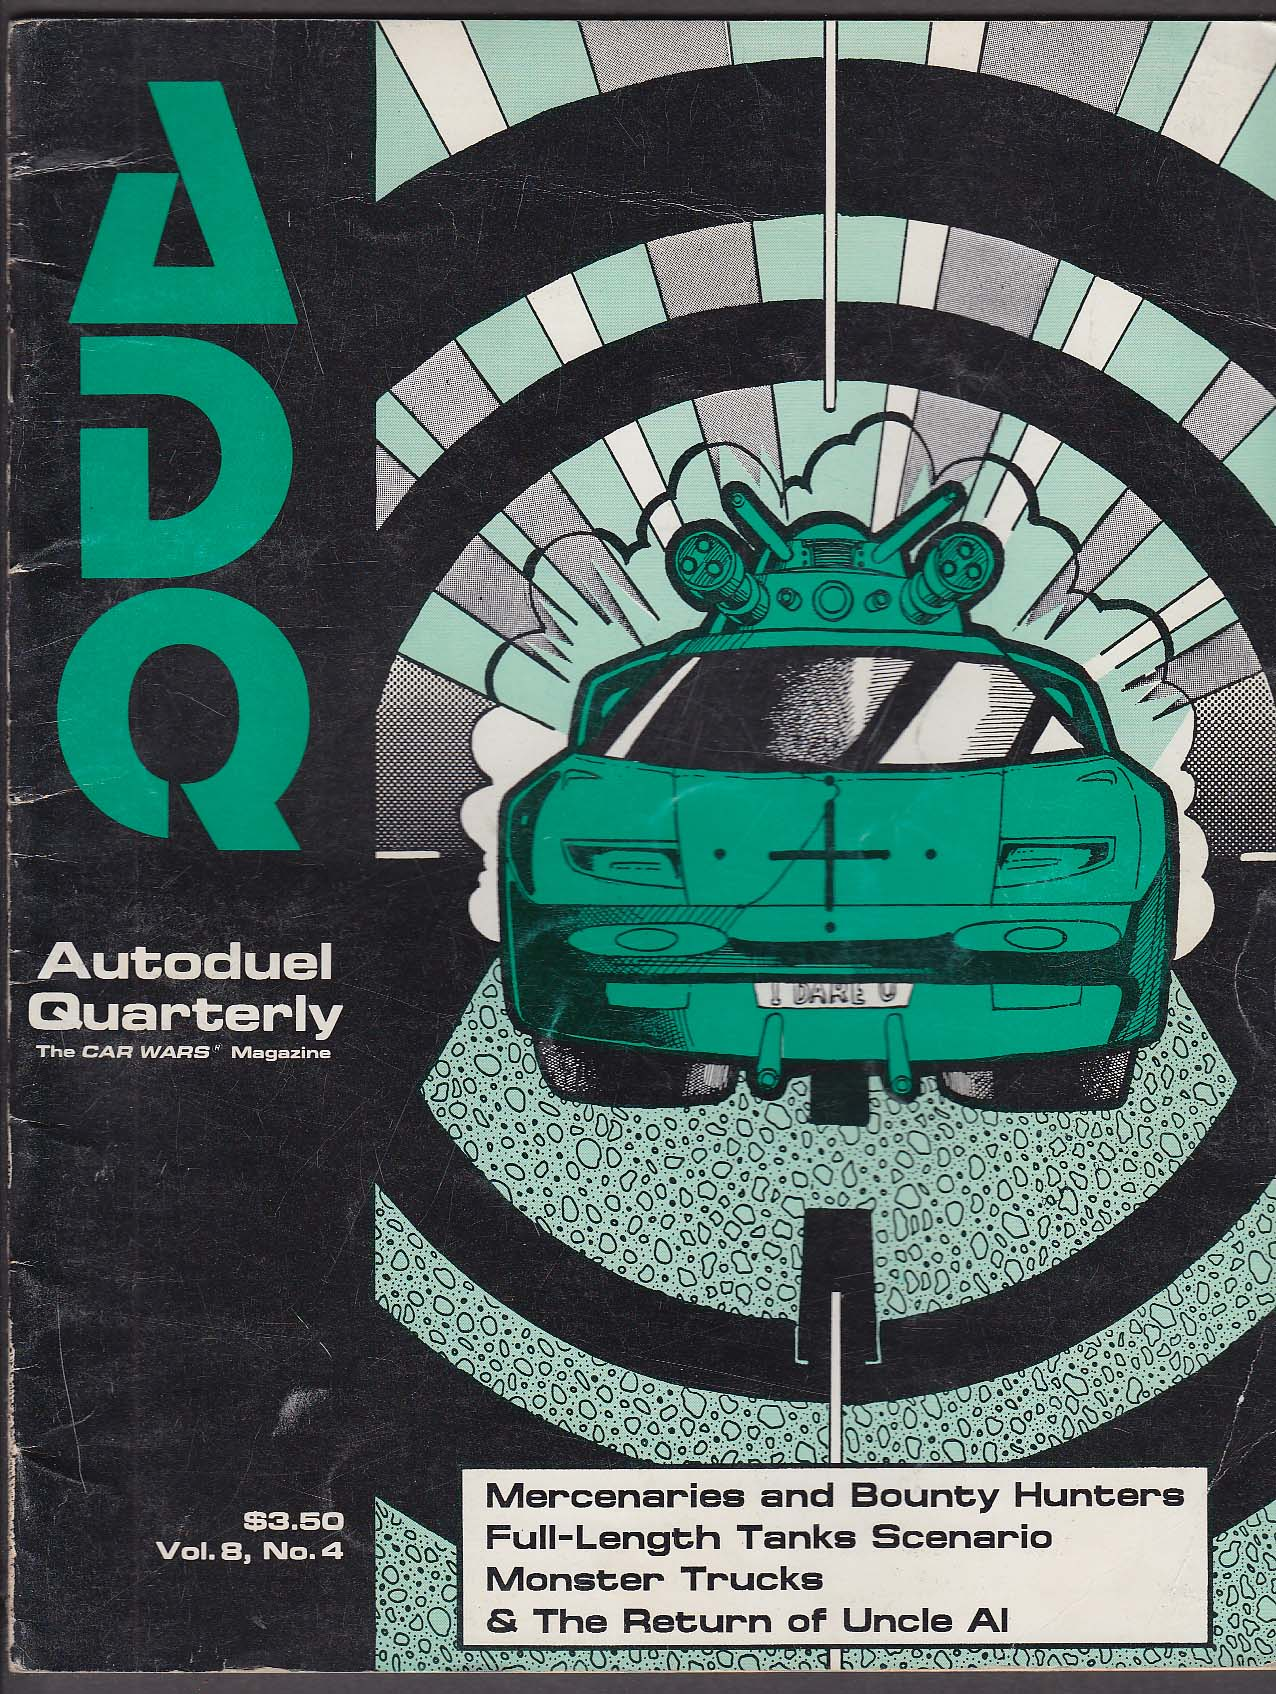 ADQ Autoduel Quarterly Vol 8 #4 Car Wars Winter 2040 Steve Jackson Games RPG 199